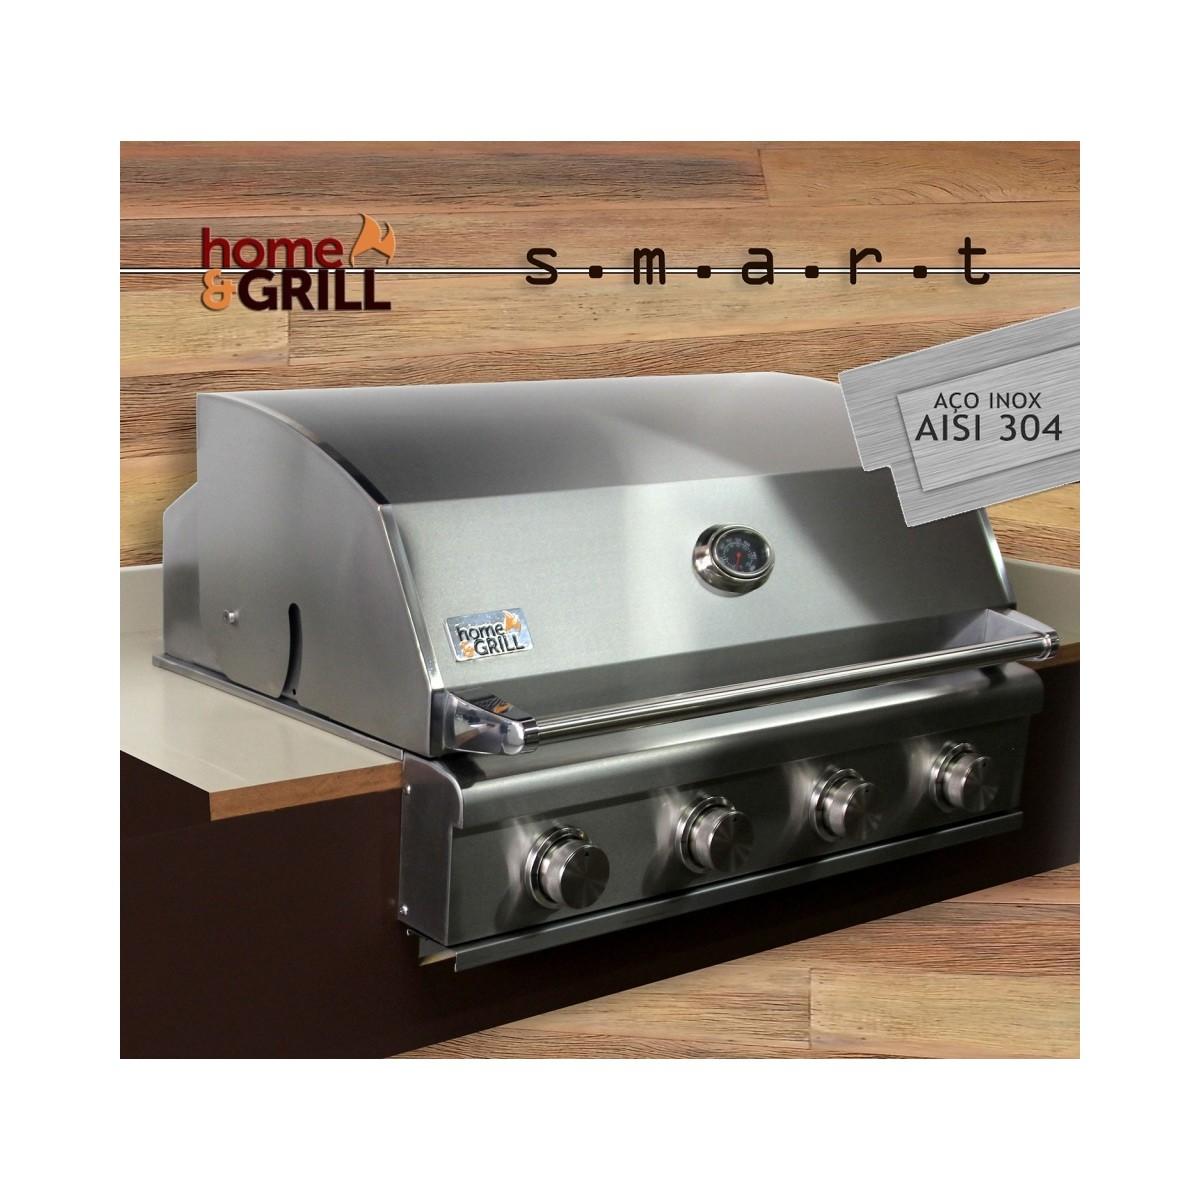 Churrasqueira a Gás Home e Grill Smart HG-4BS - 4 Queimadores - 100% Inox 304  - Sua Casa Gourmet e Cia